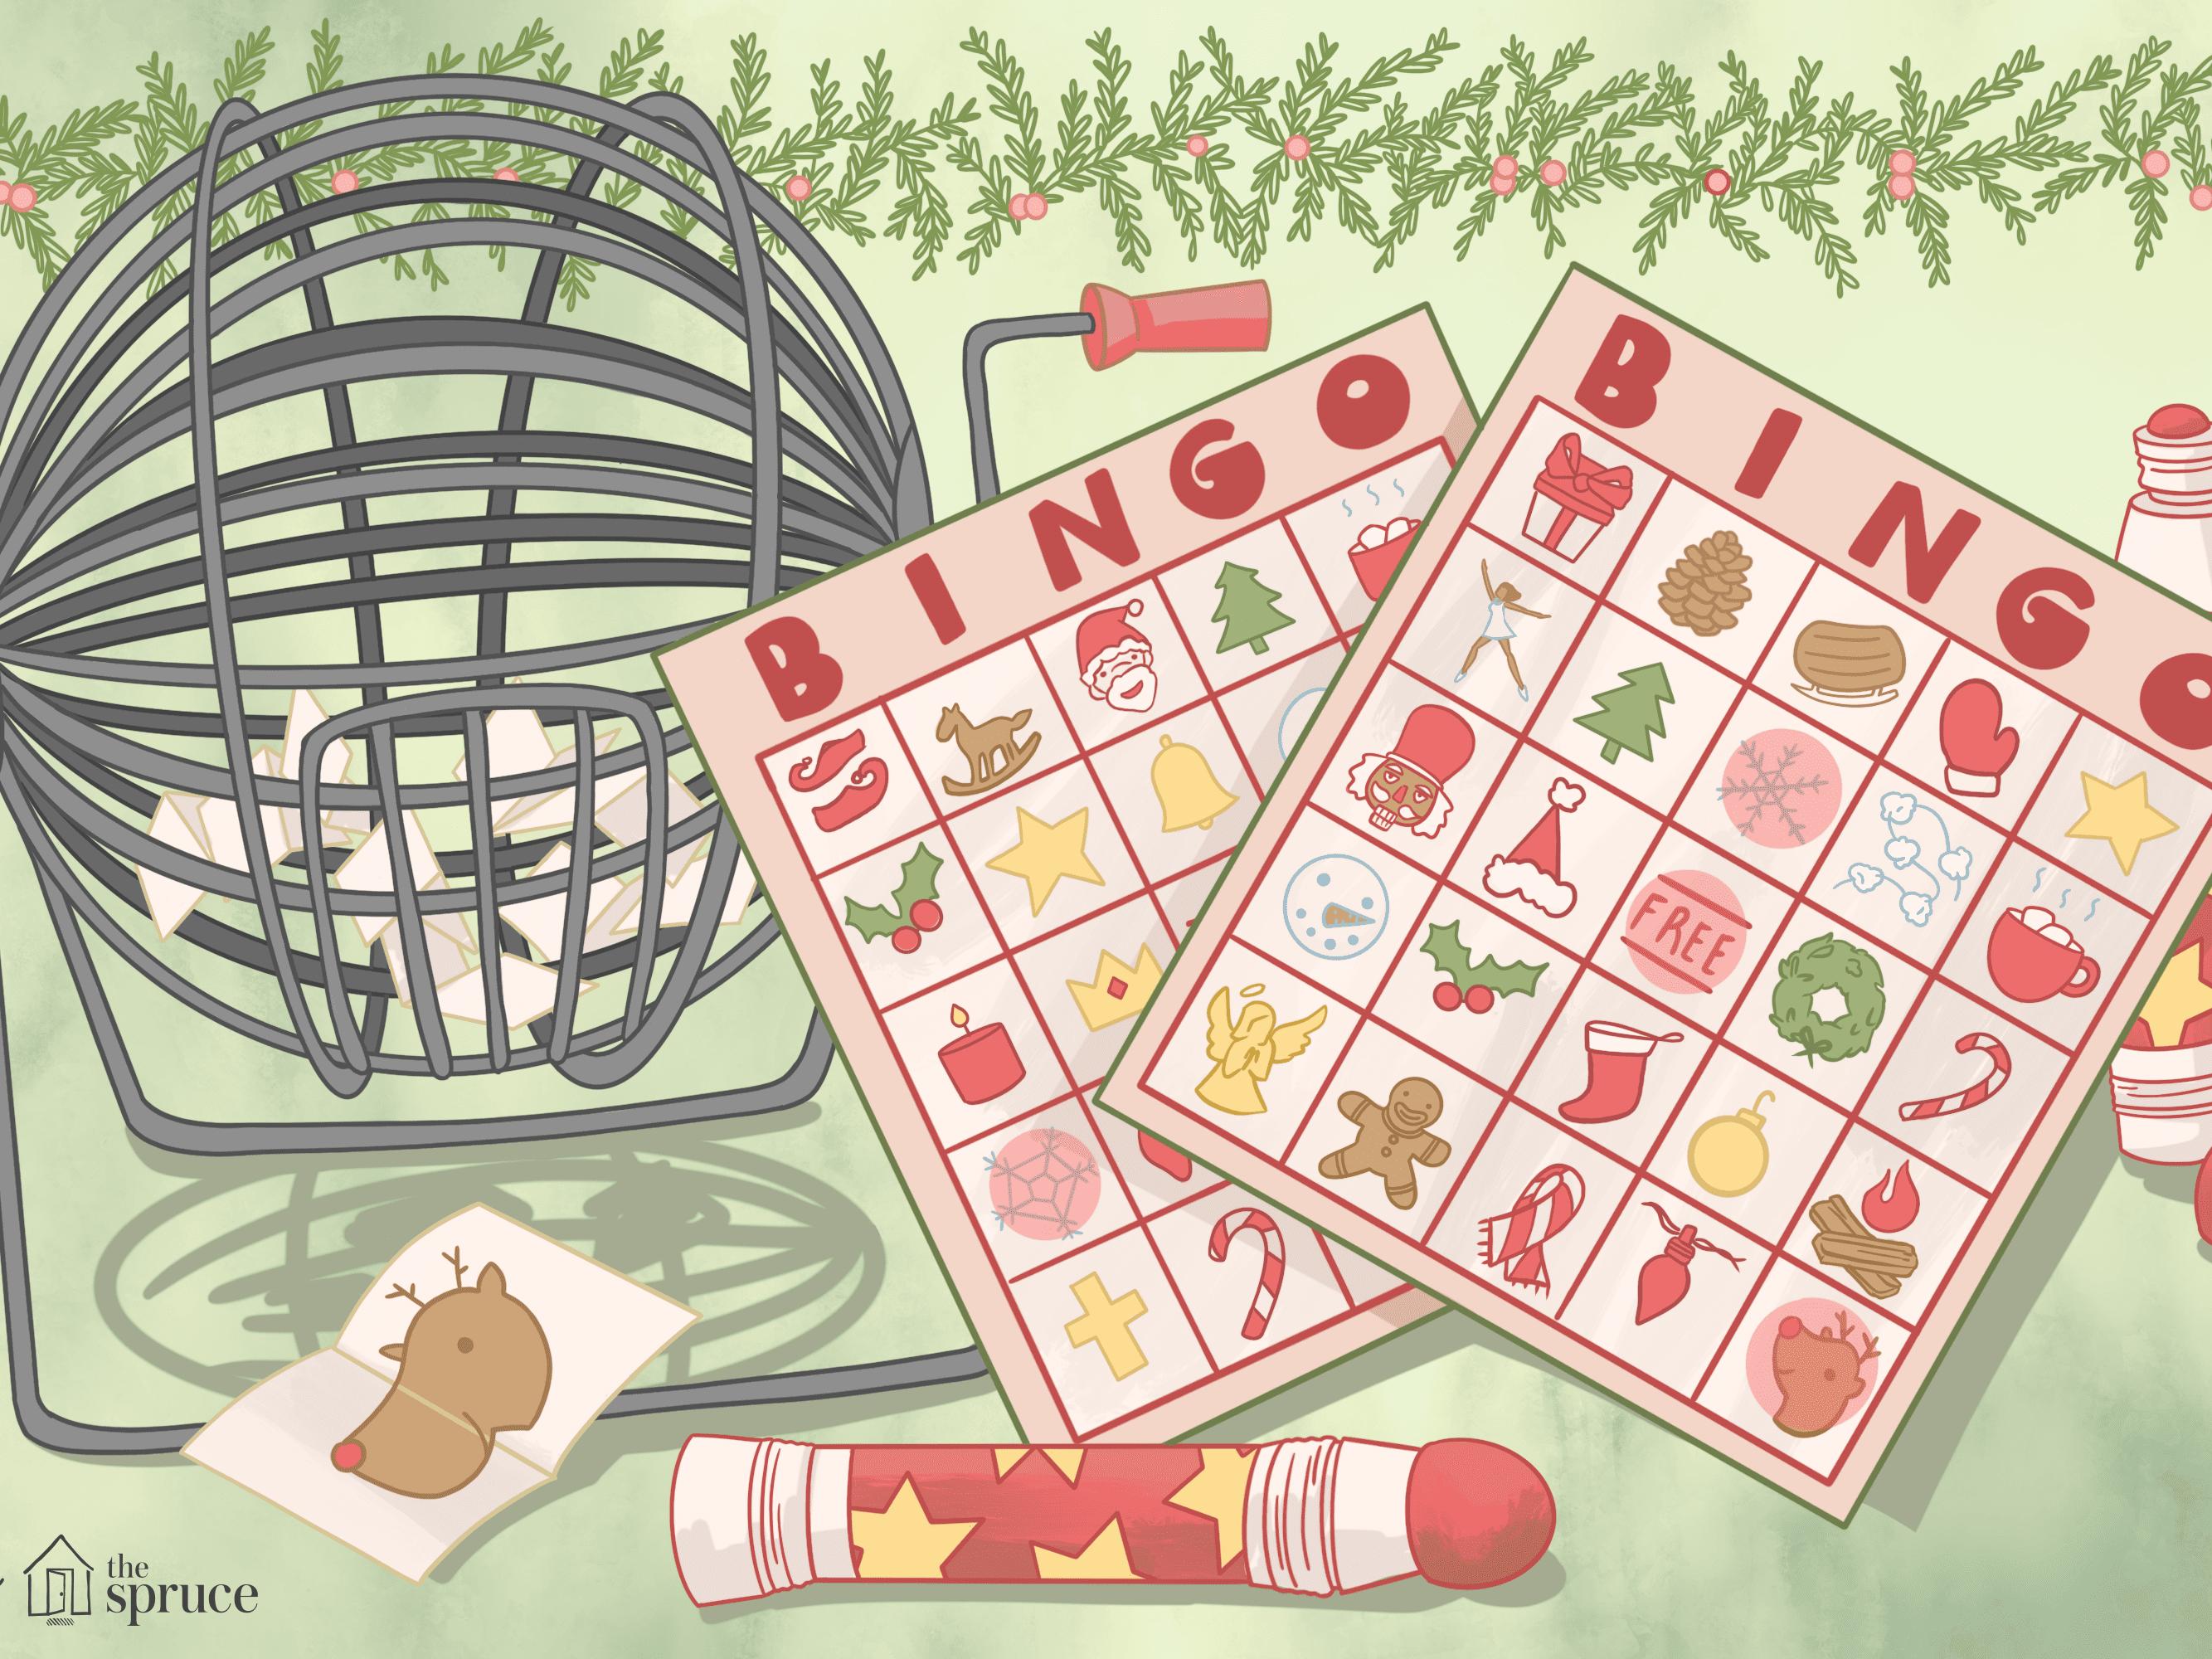 21 Free, Printable Christmas Bingo Games for the Family For Blank Bingo Card Template Microsoft Word